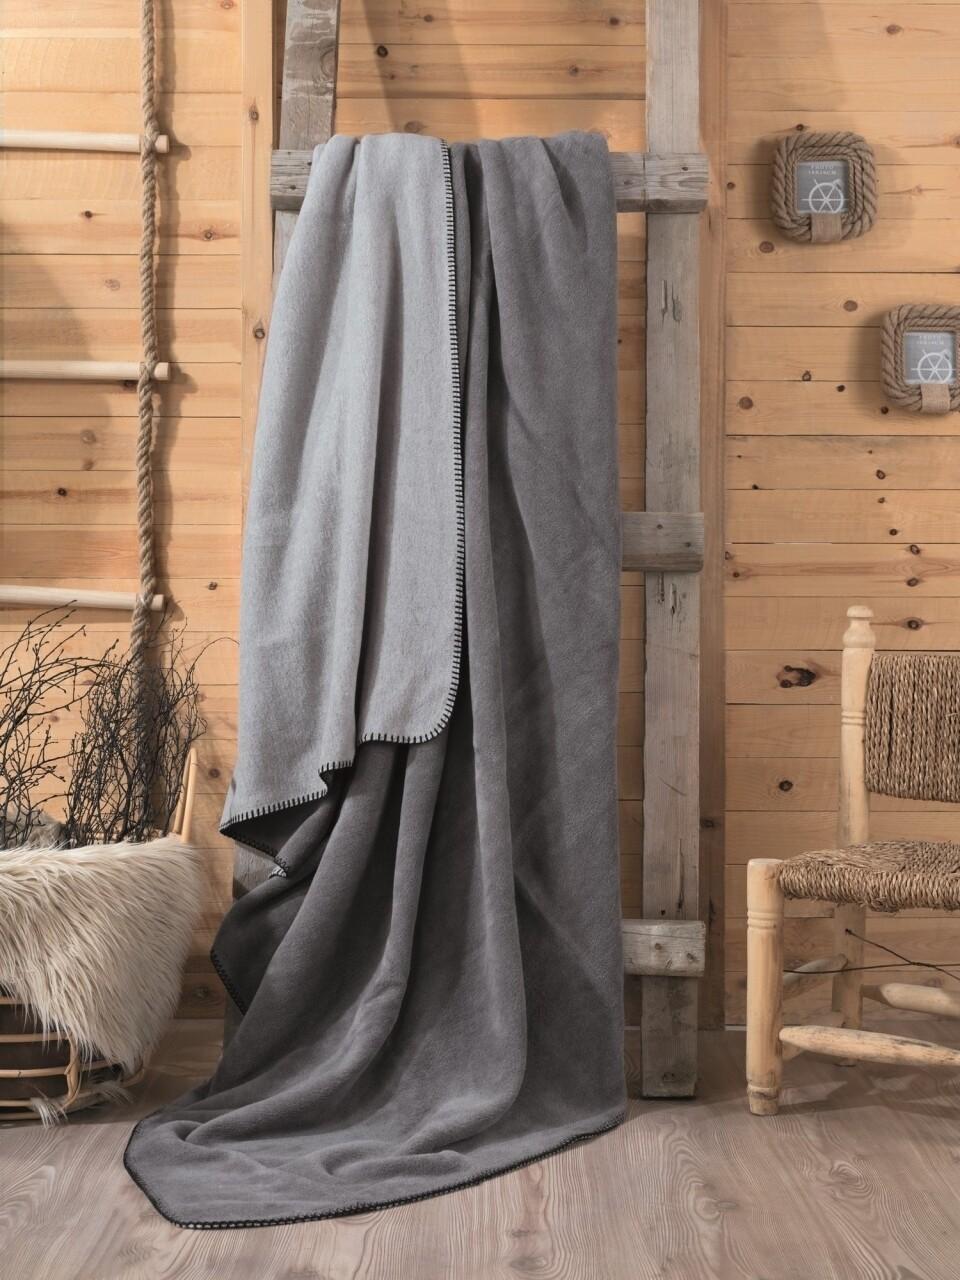 Patura pentru pat dublu din bumbac si acrylic, 200x200 cm, Cotton Box, gri